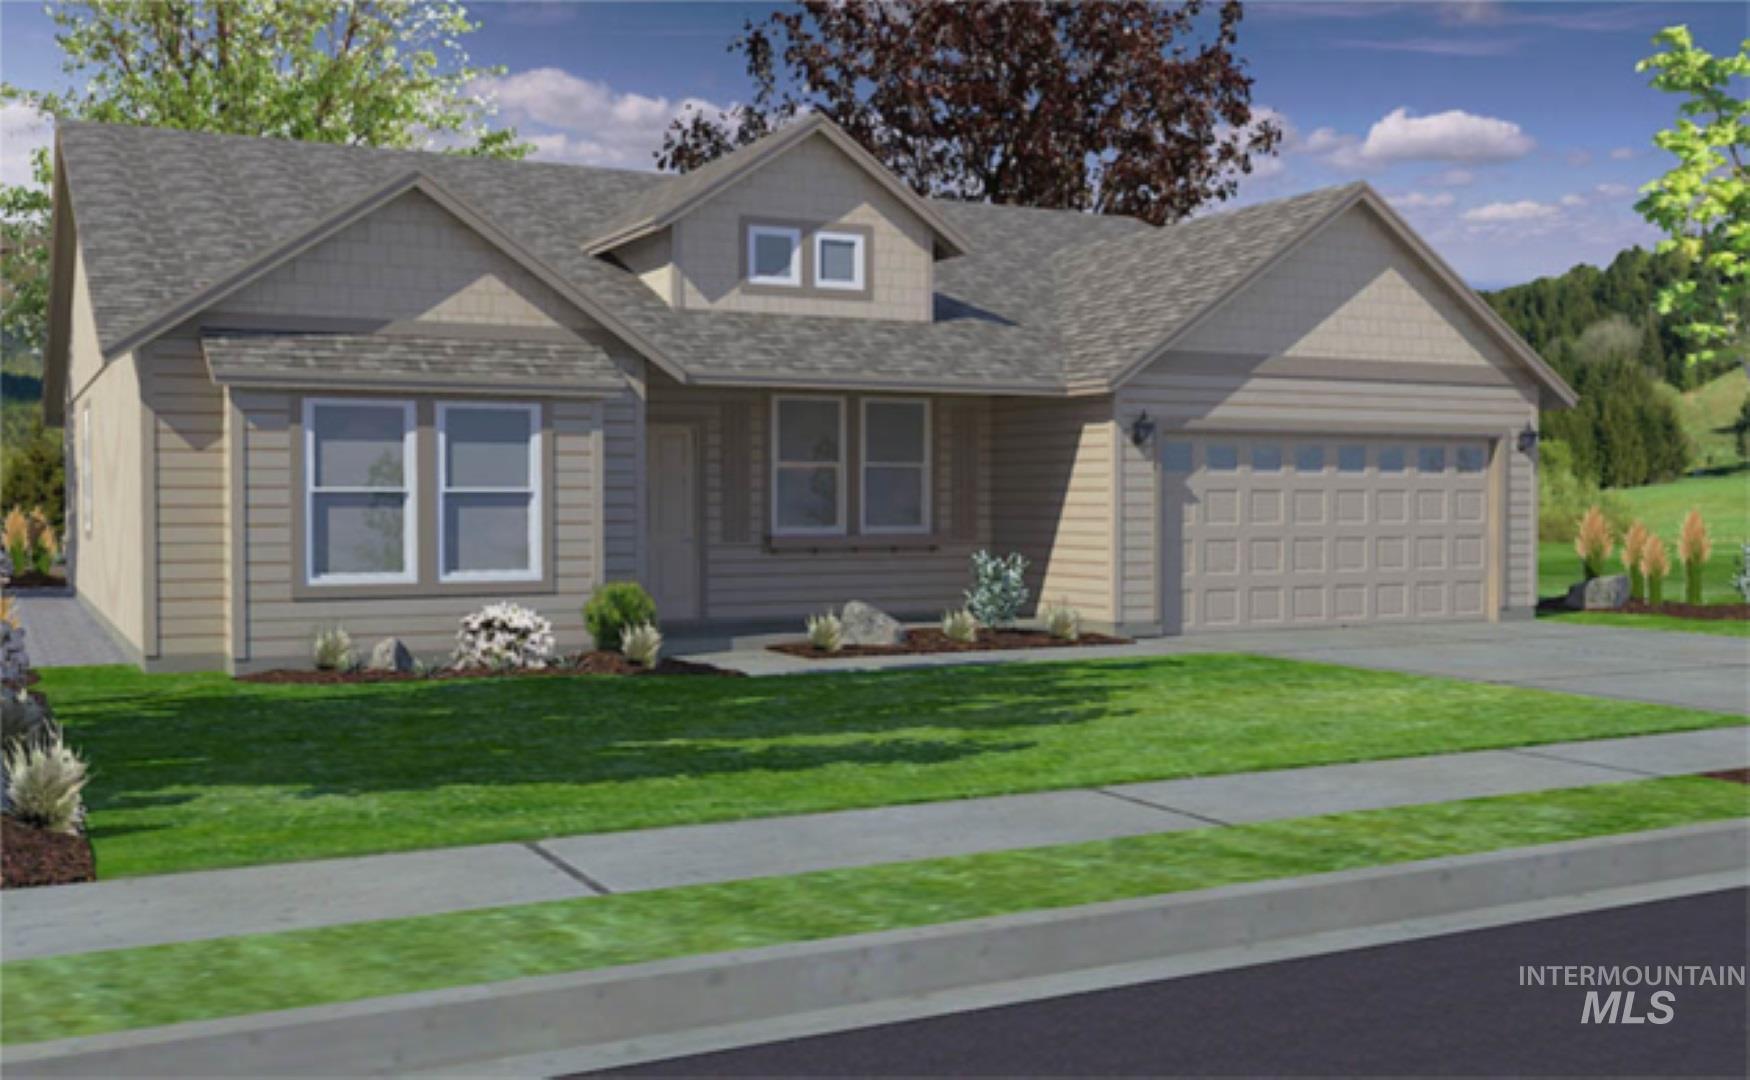 Lot 6 Blk 1 Mitera Subdivison Property Photo - Boise, ID real estate listing